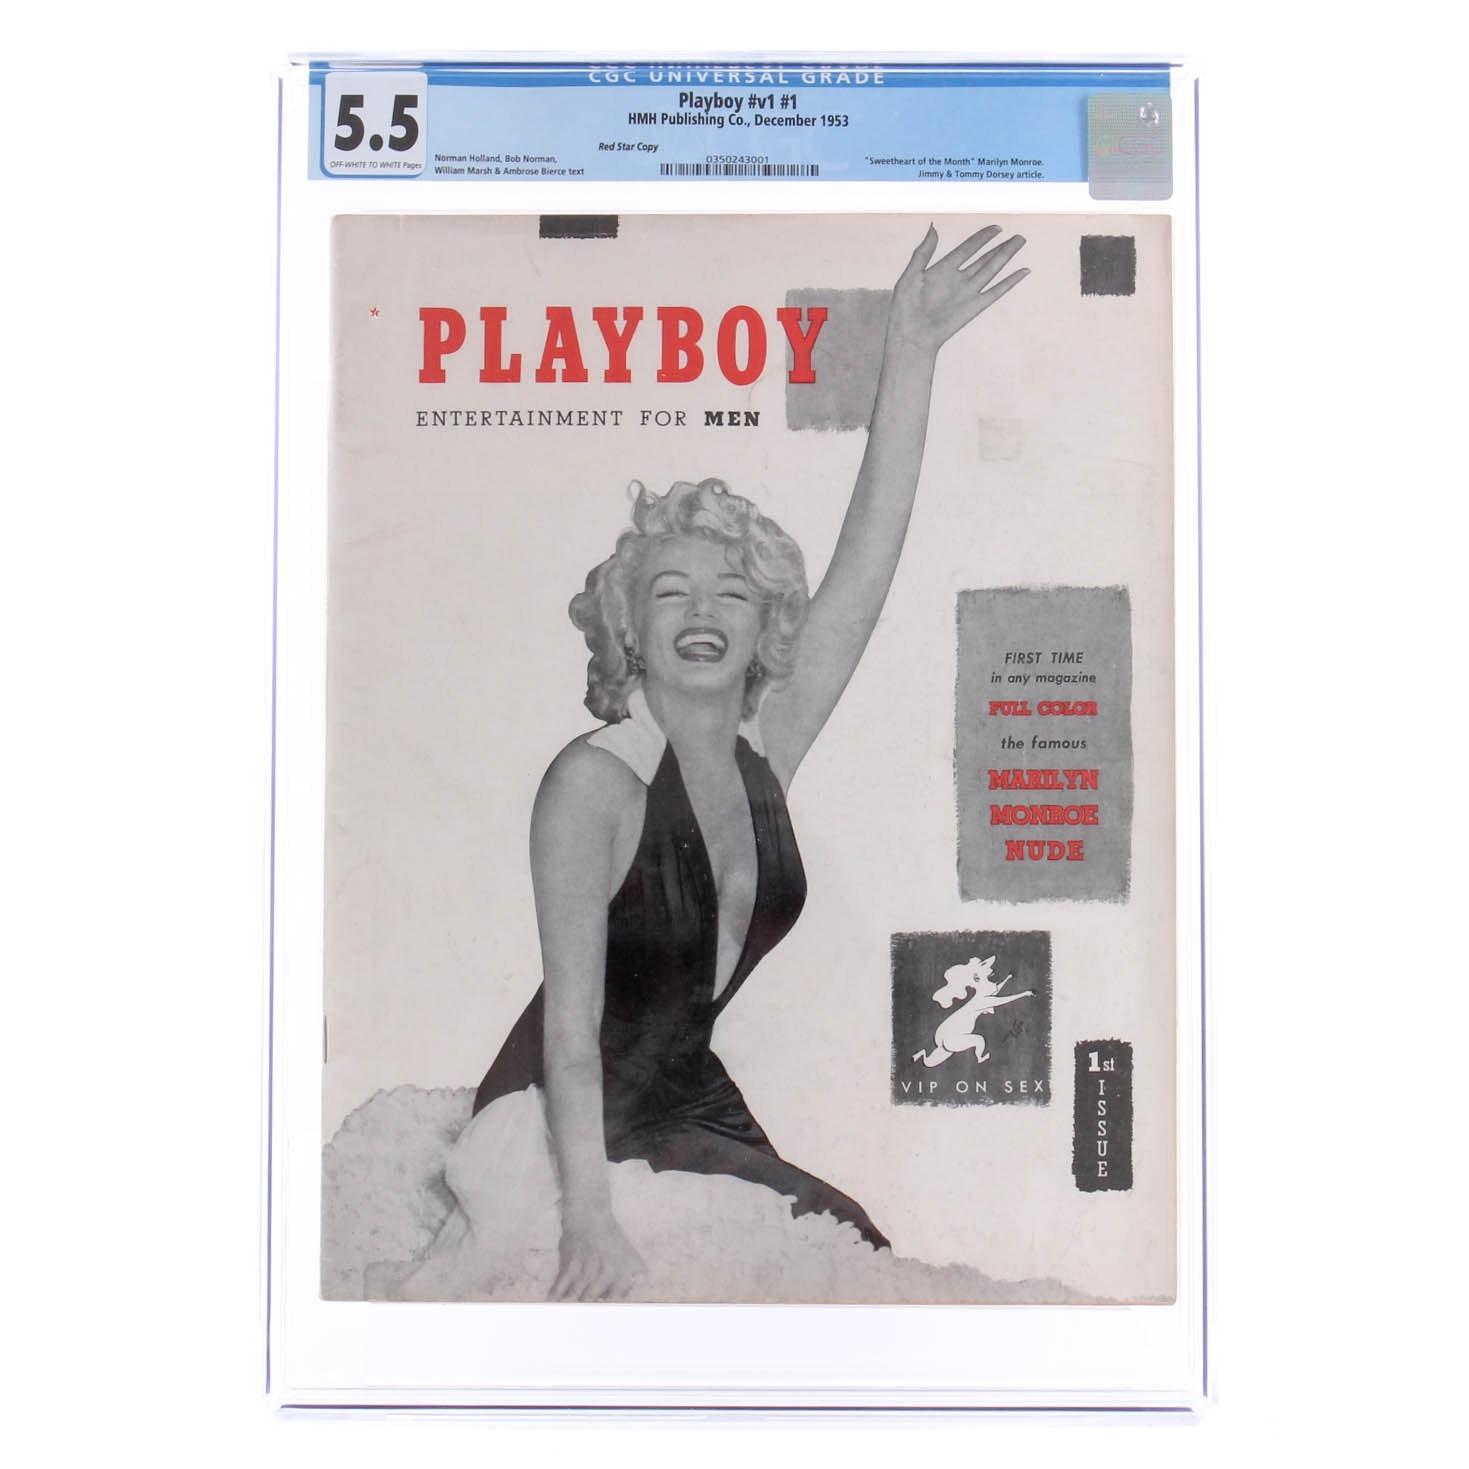 Rare 1953 Red Star Playboy V1 #1 CGC 5.5 Graded Magazine